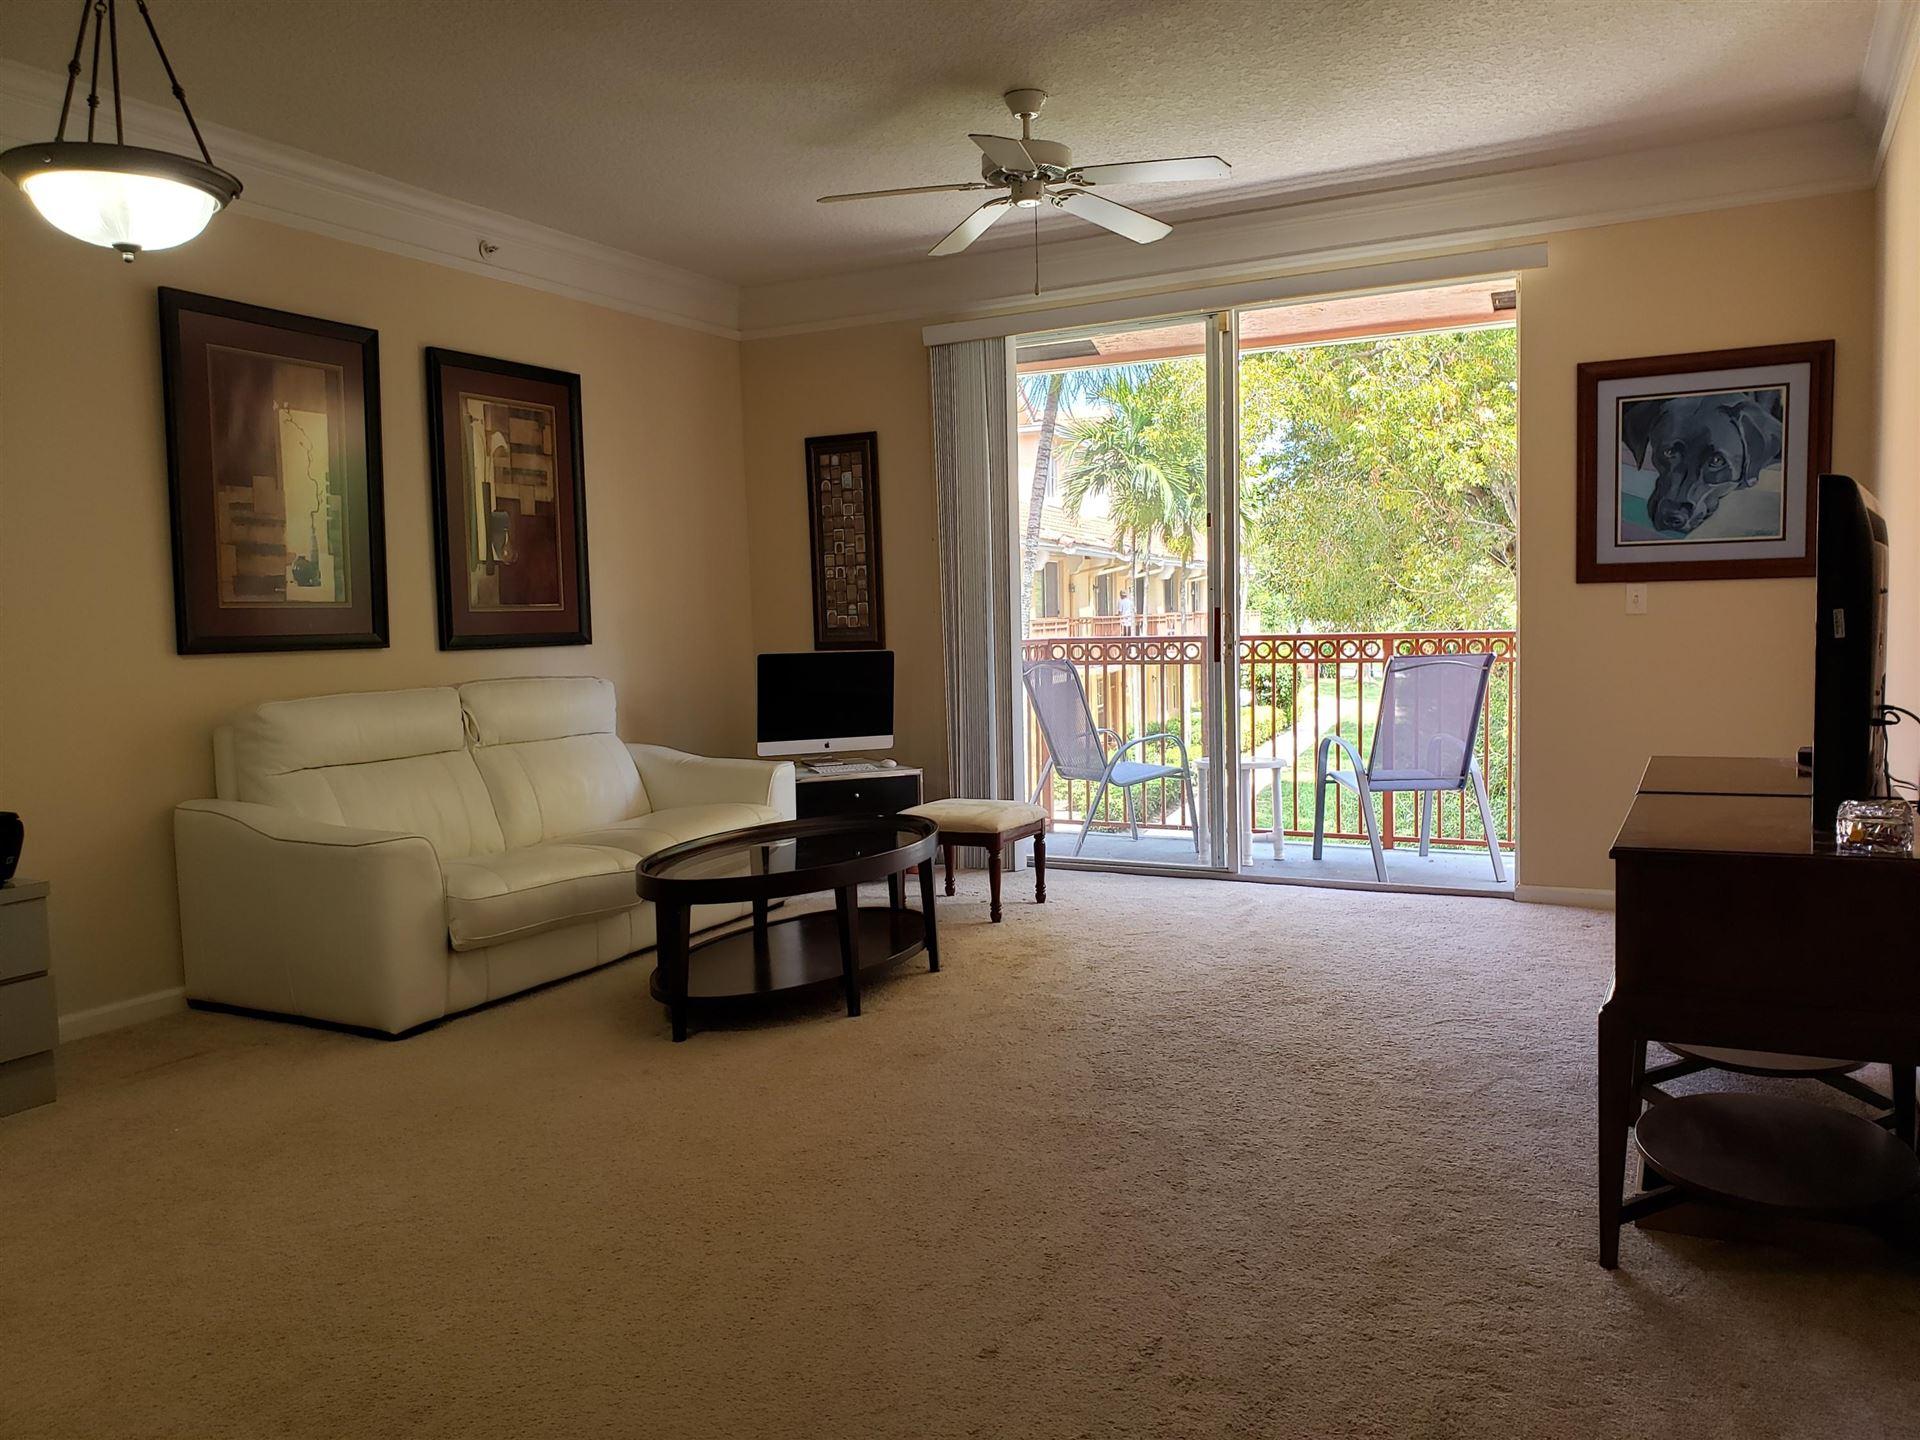 2022 Alta Meadows Lane #603, Delray Beach, FL 33444 - #: RX-10613904